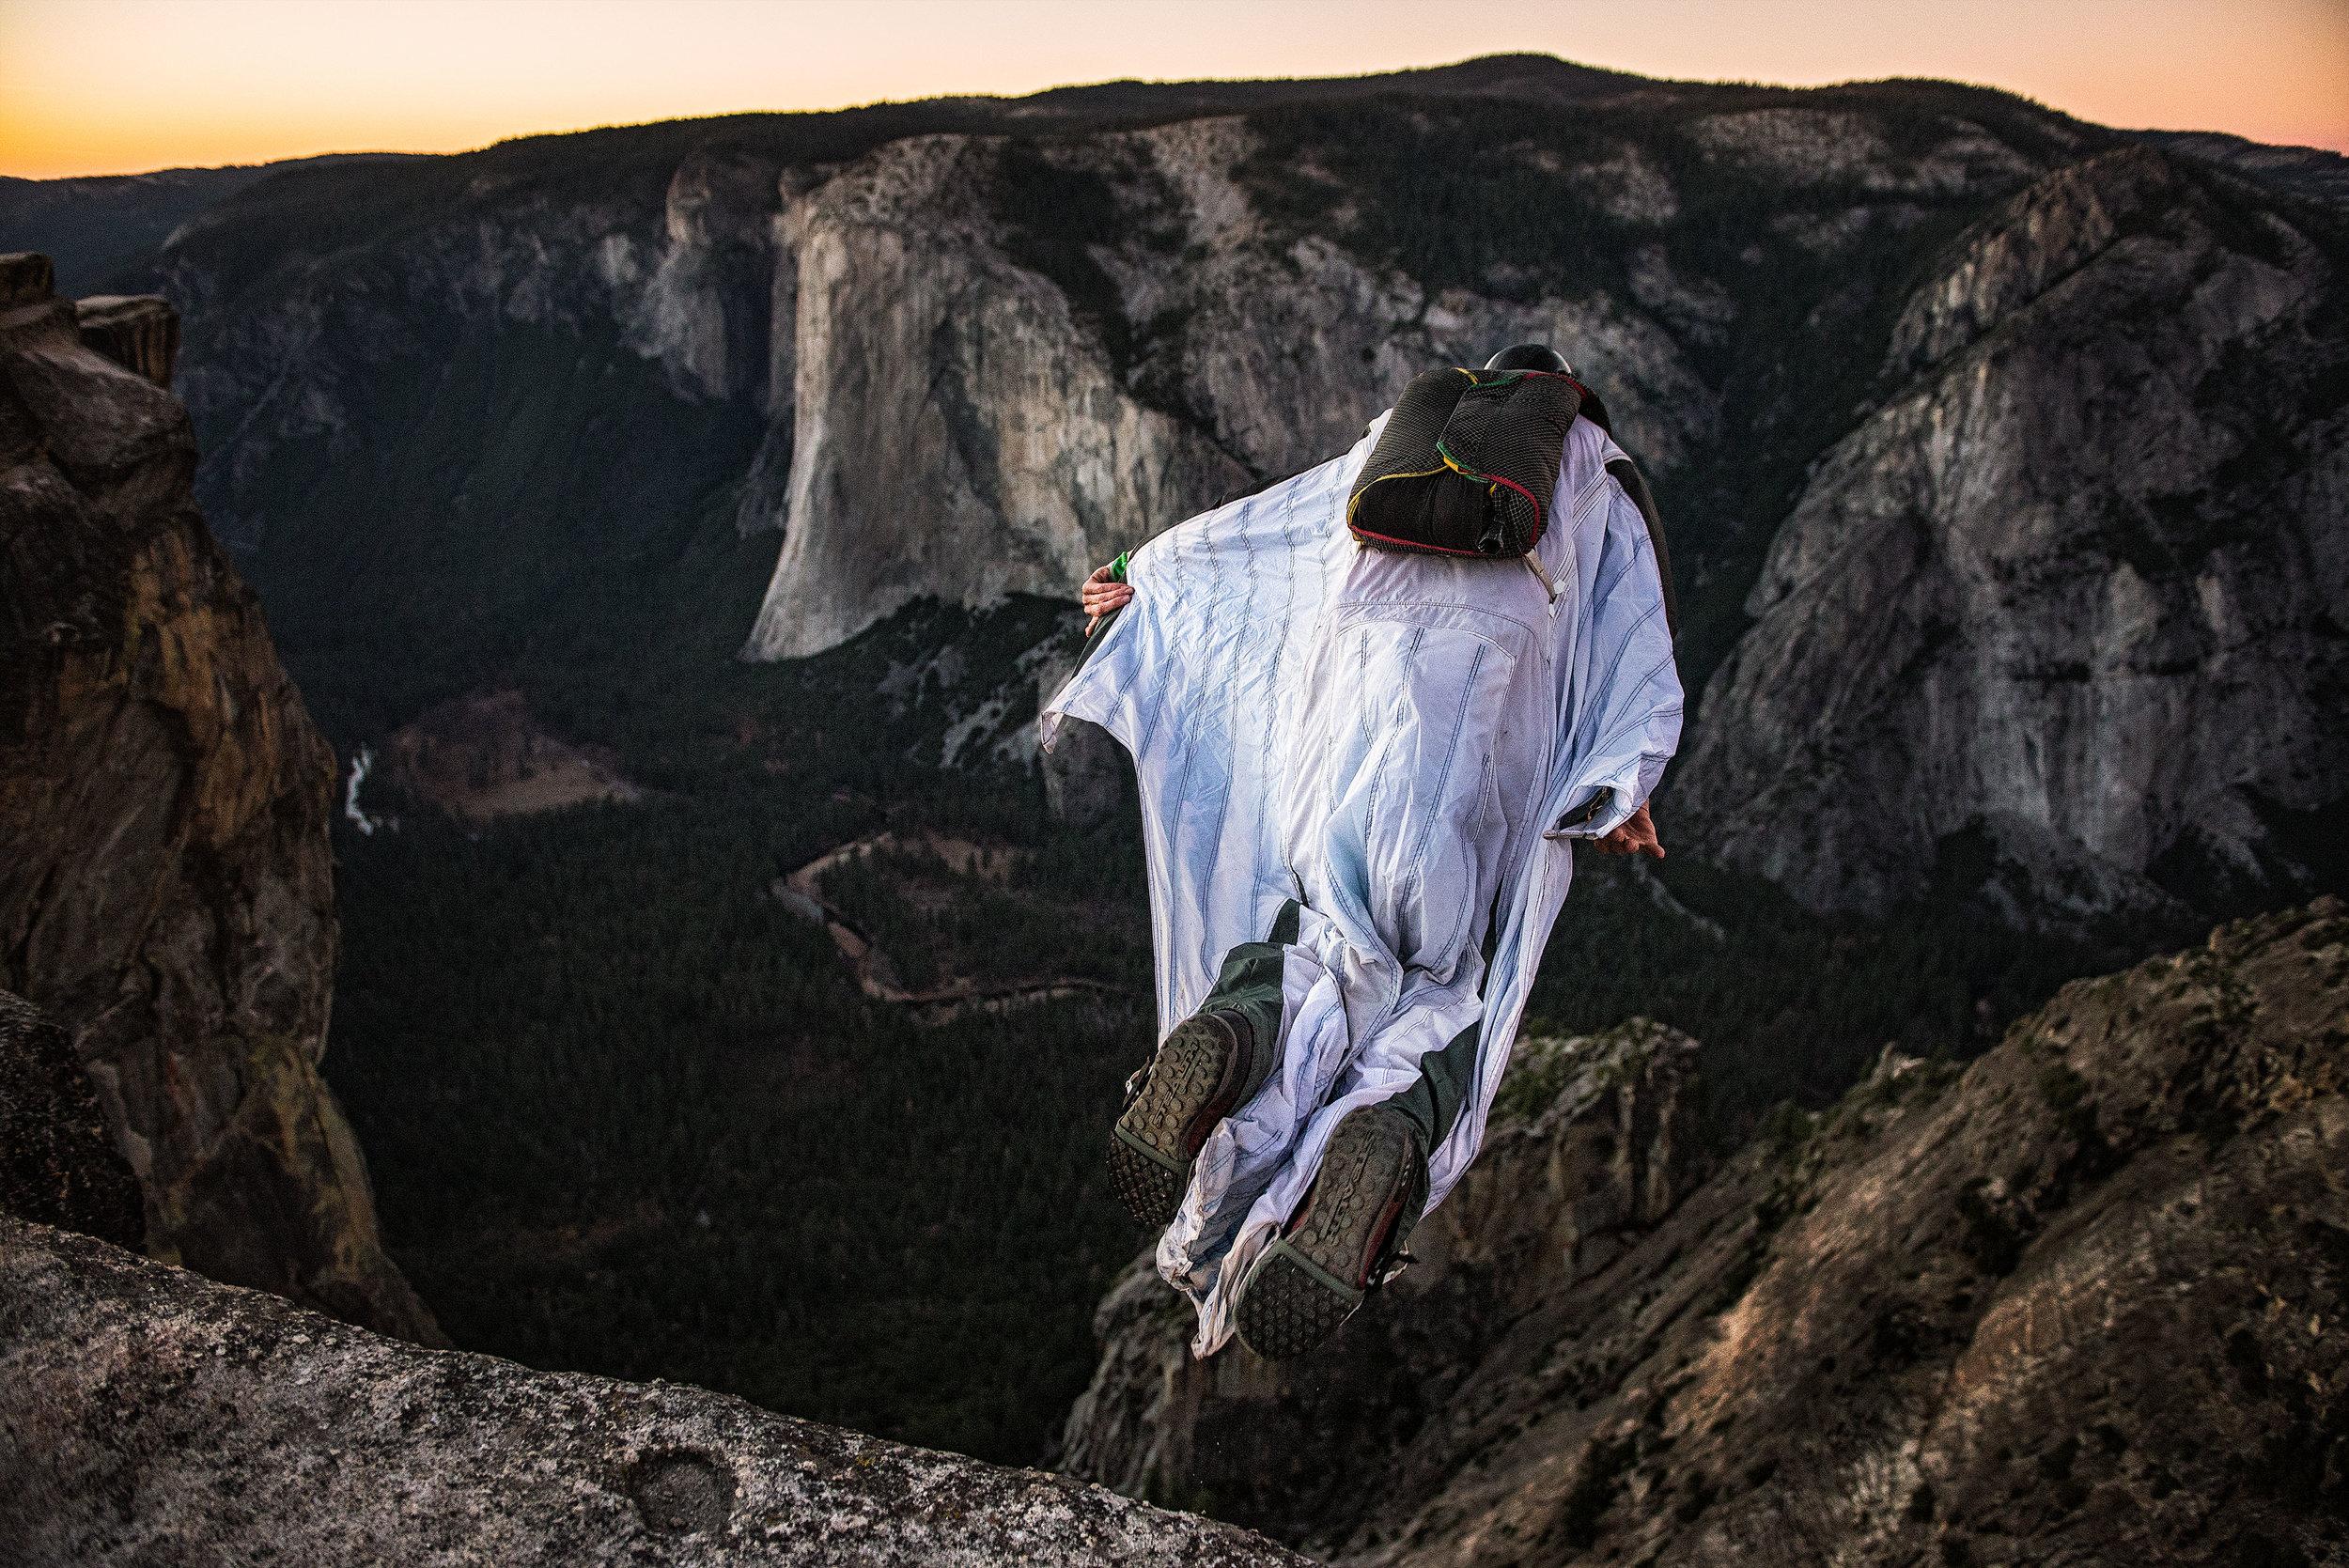 austin-trigg-wing-suit-base-jump-fly-sunset-taft-point-yosemite-lifestyle-california-adventure-thrill-seeking-el-capitan-free-fall.jpg